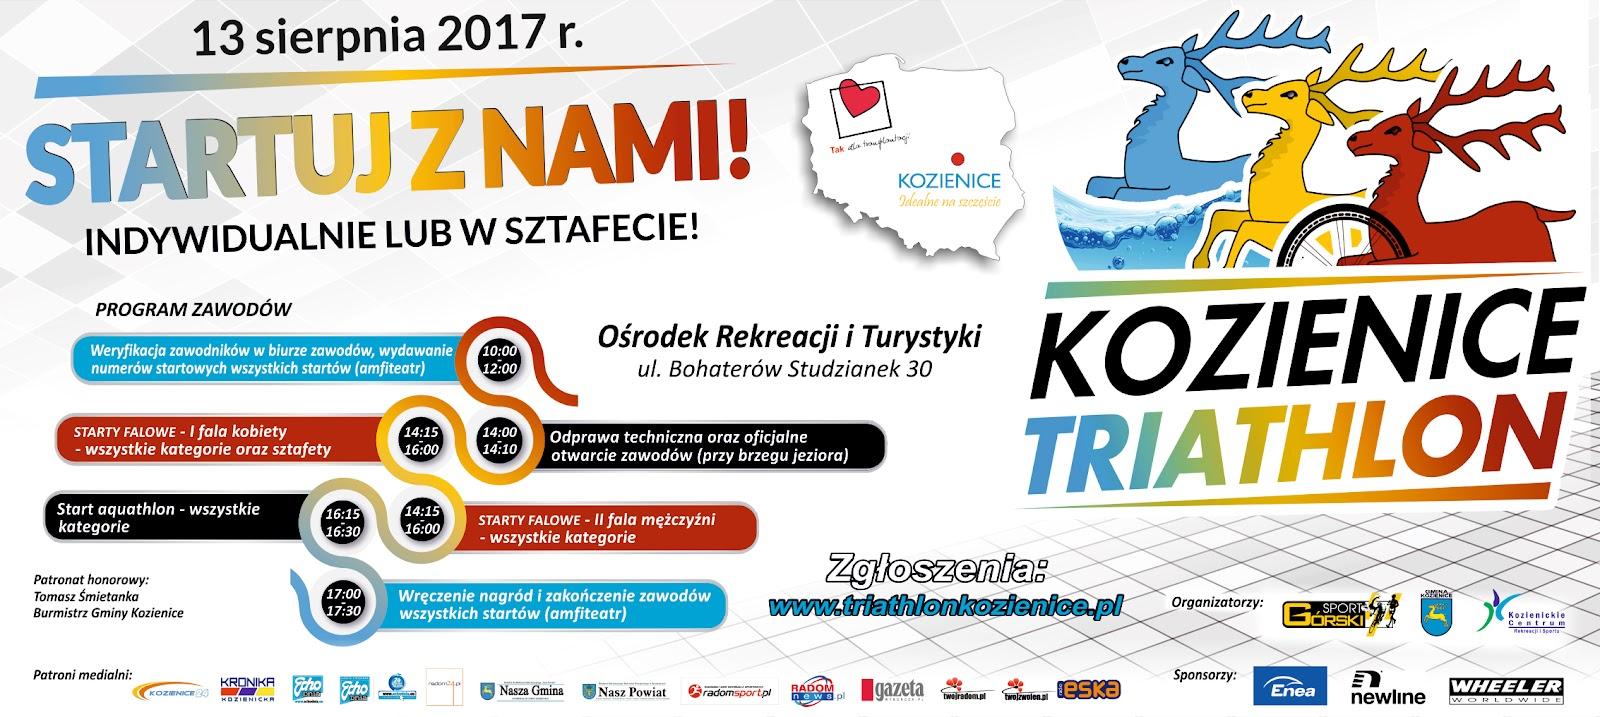 Kozienice triathlon baner 2017 480X215.jpg